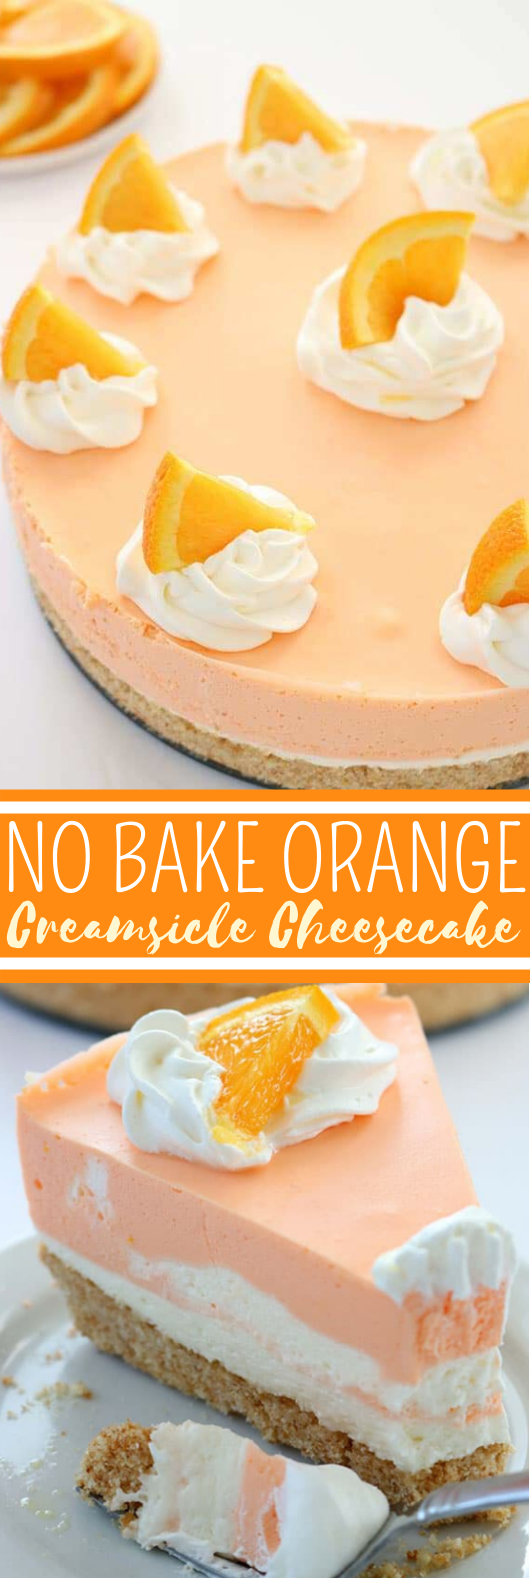 No Bake Orange Creamsicle Cheesecake #dessert #cake #nobake #cheesecake #orange